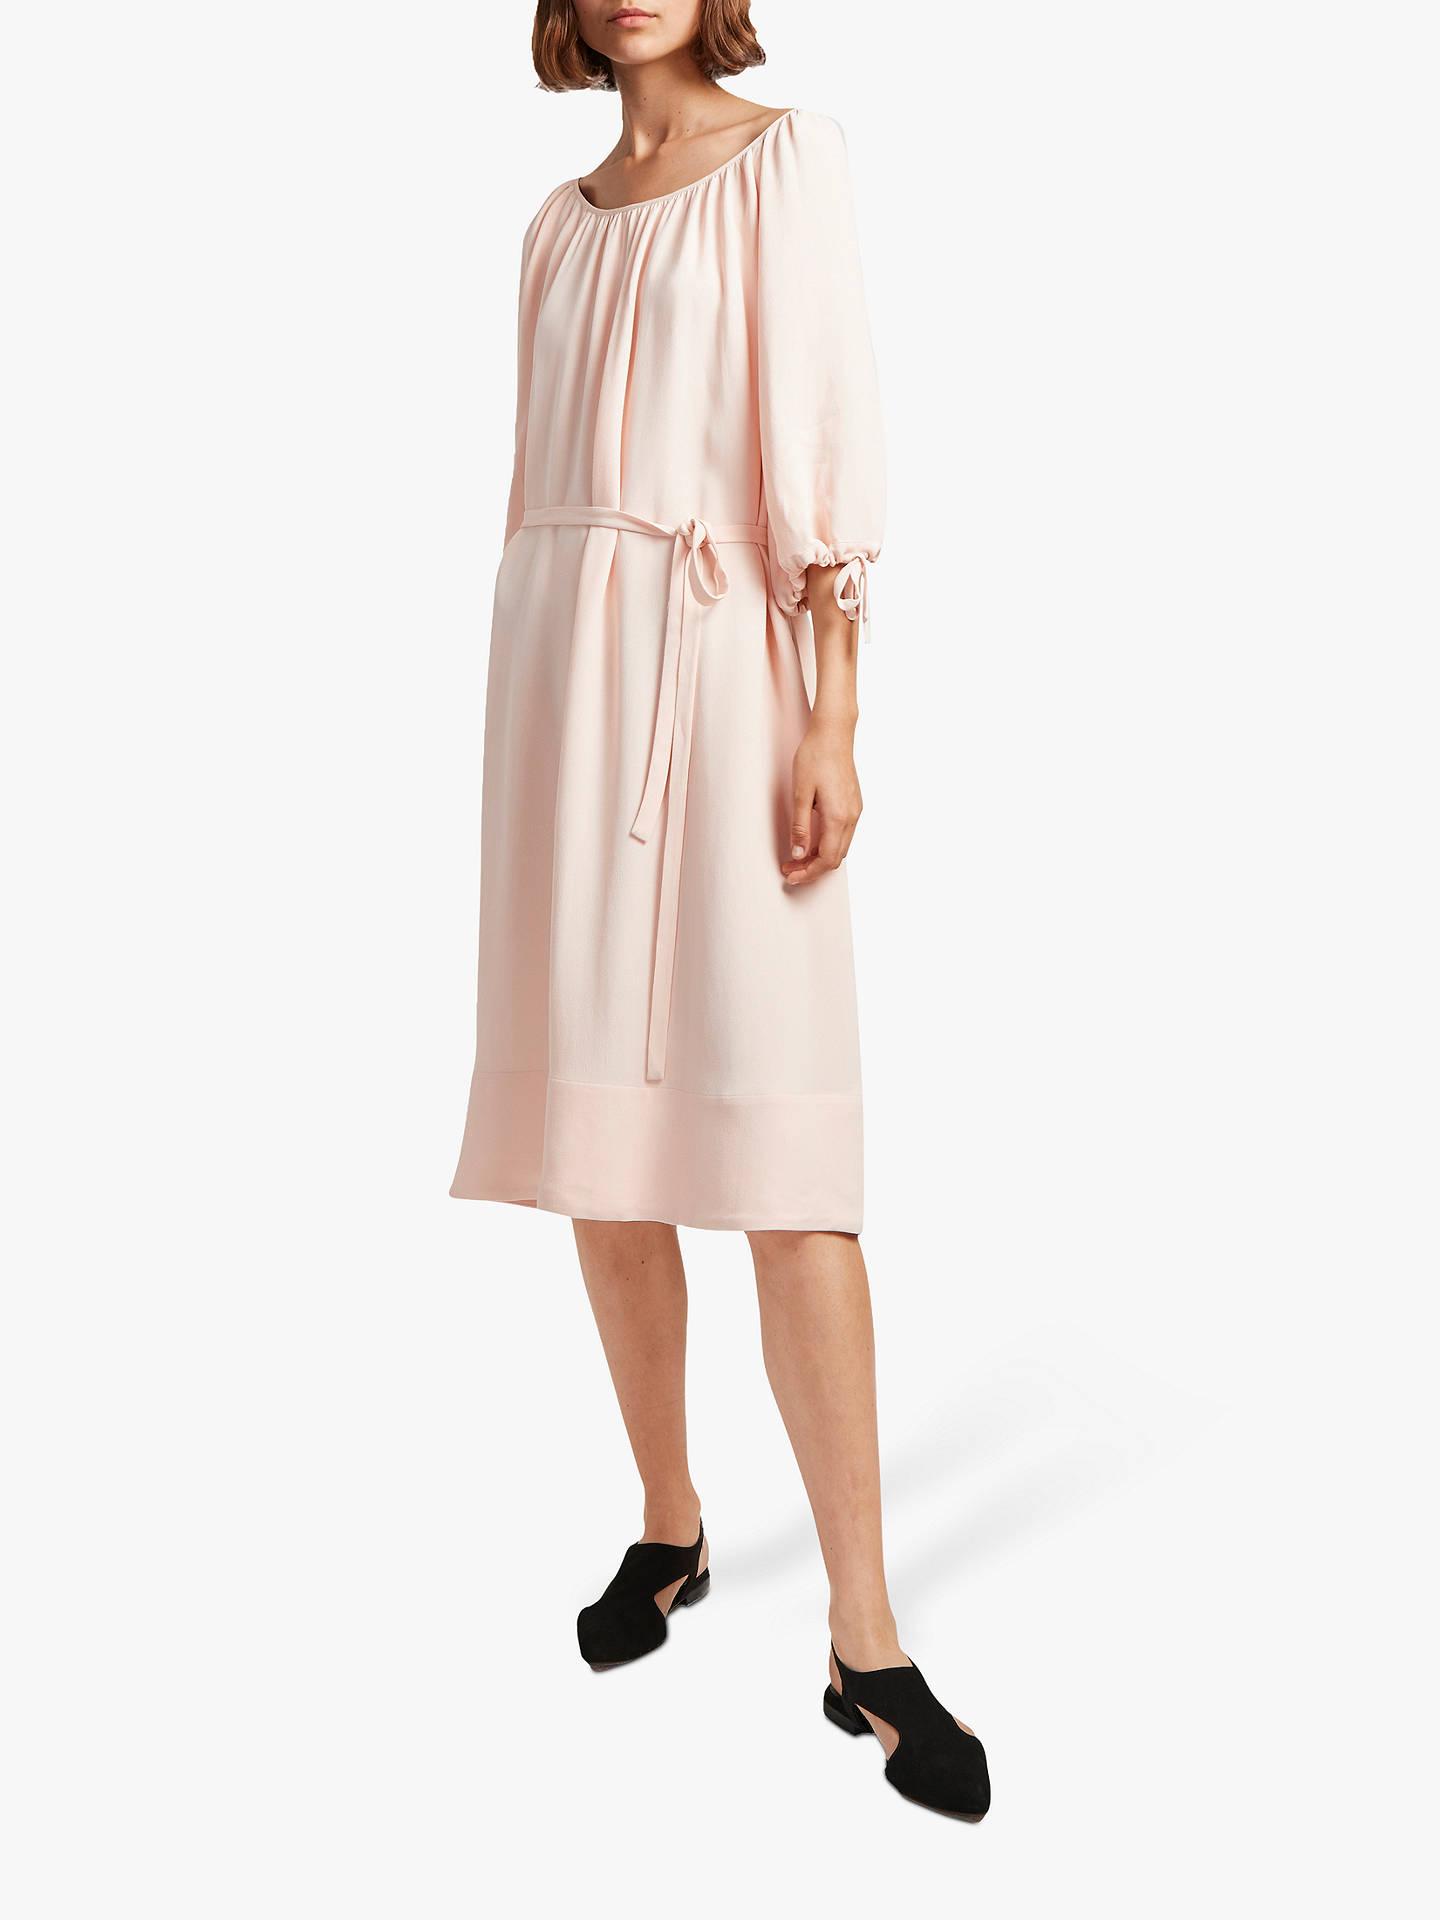 36c8ec6f6dc Buy French Connection Ezmiya Smock Dress, Satin Slipper, 8 Online at  johnlewis.com ...